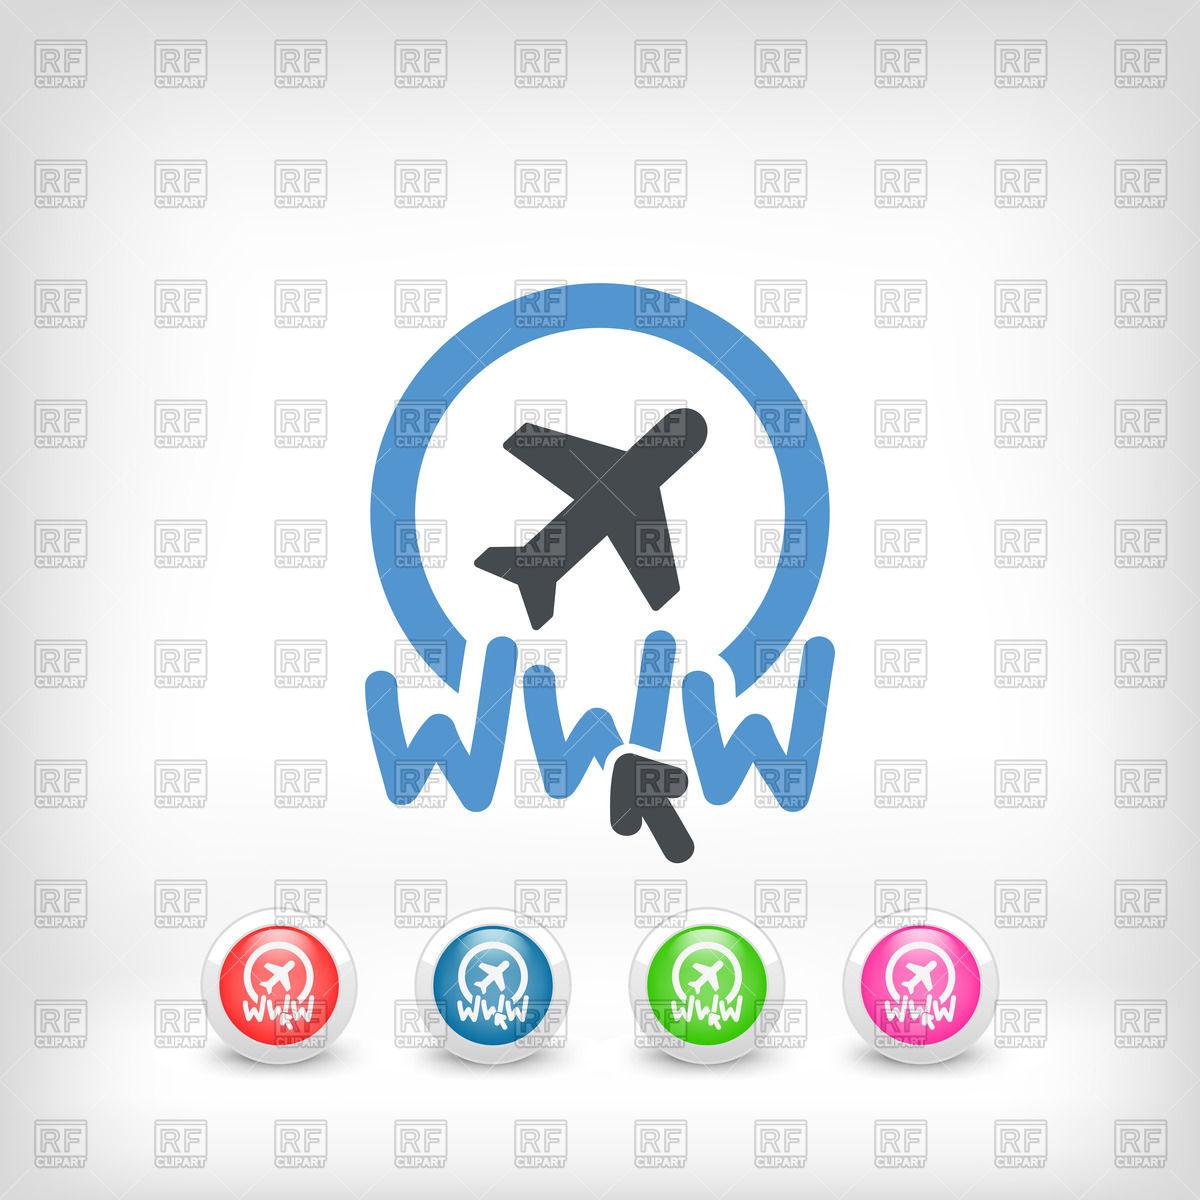 1200x1200 Website Travel Agency Icon Vector Image Vector Artwork Of Travel